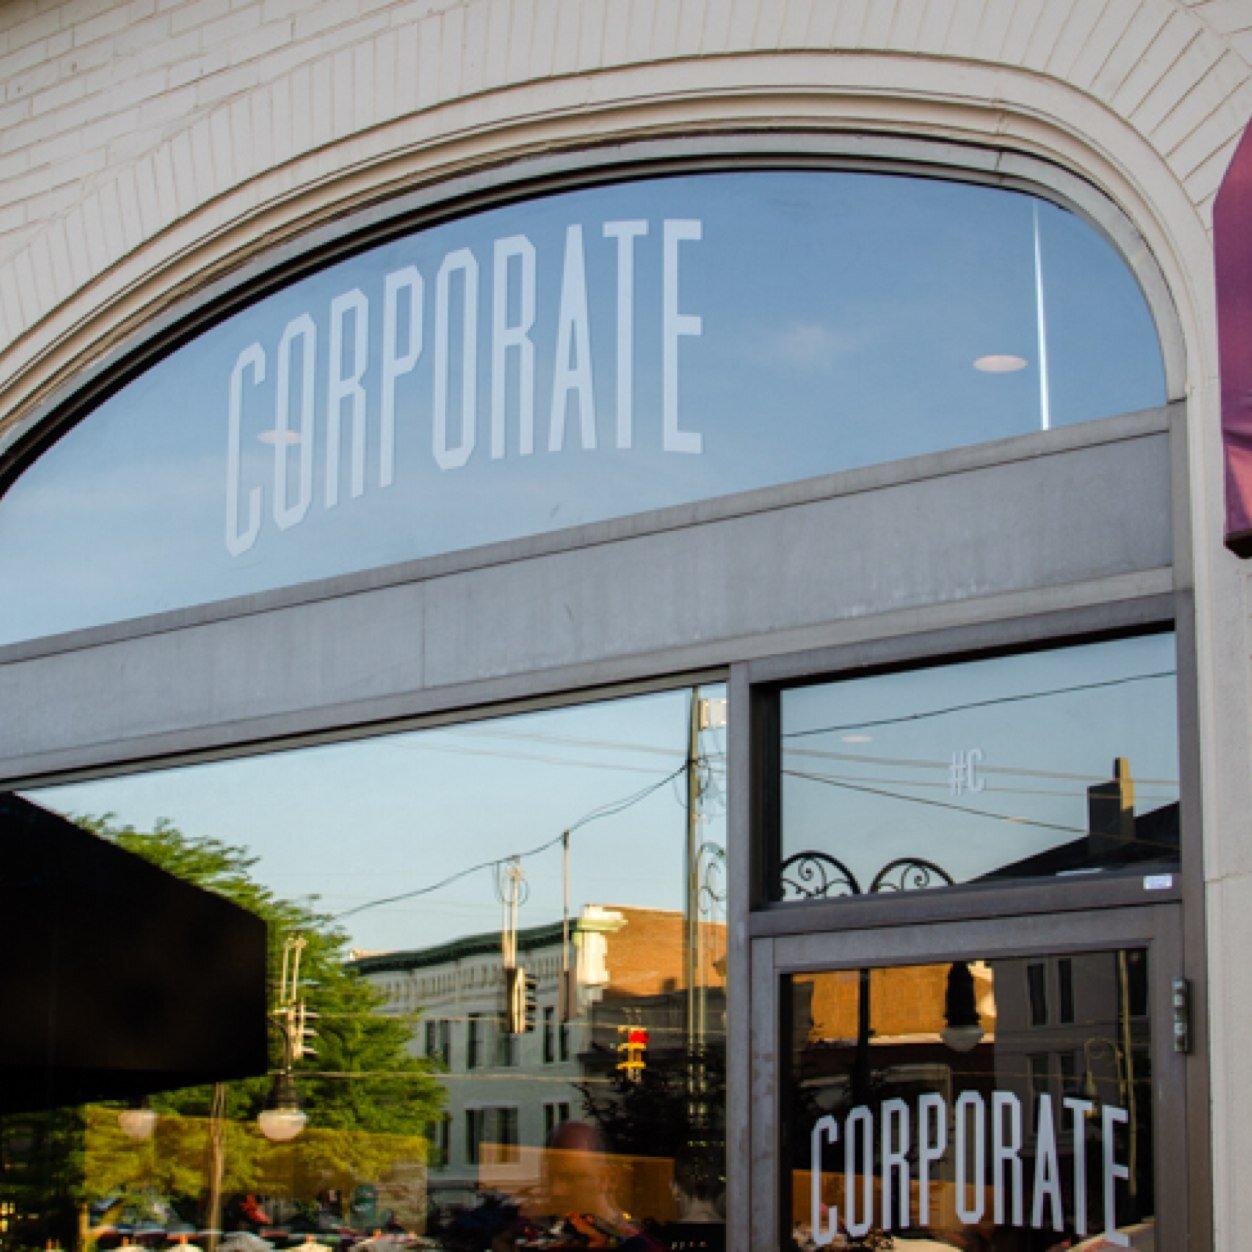 Corporate (@Corporategotem) | Twitter